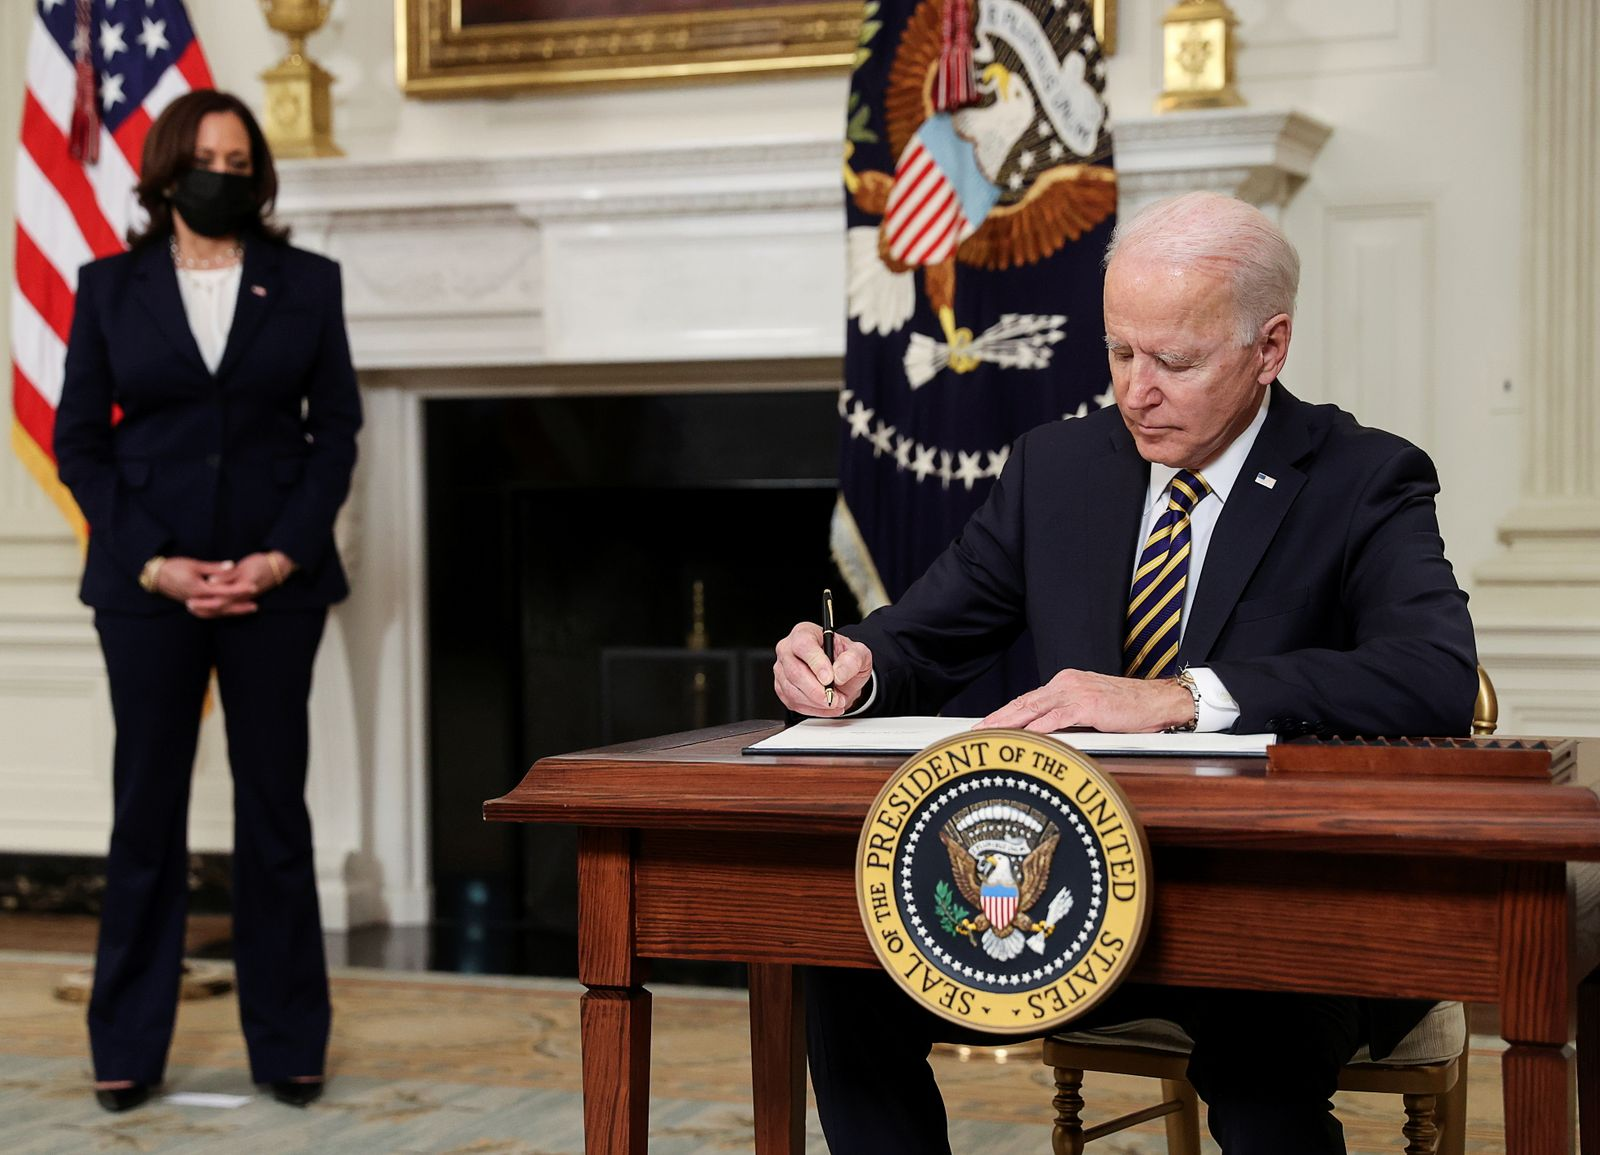 U.S. President Biden signs an executive order on the economy at the White House in Washington